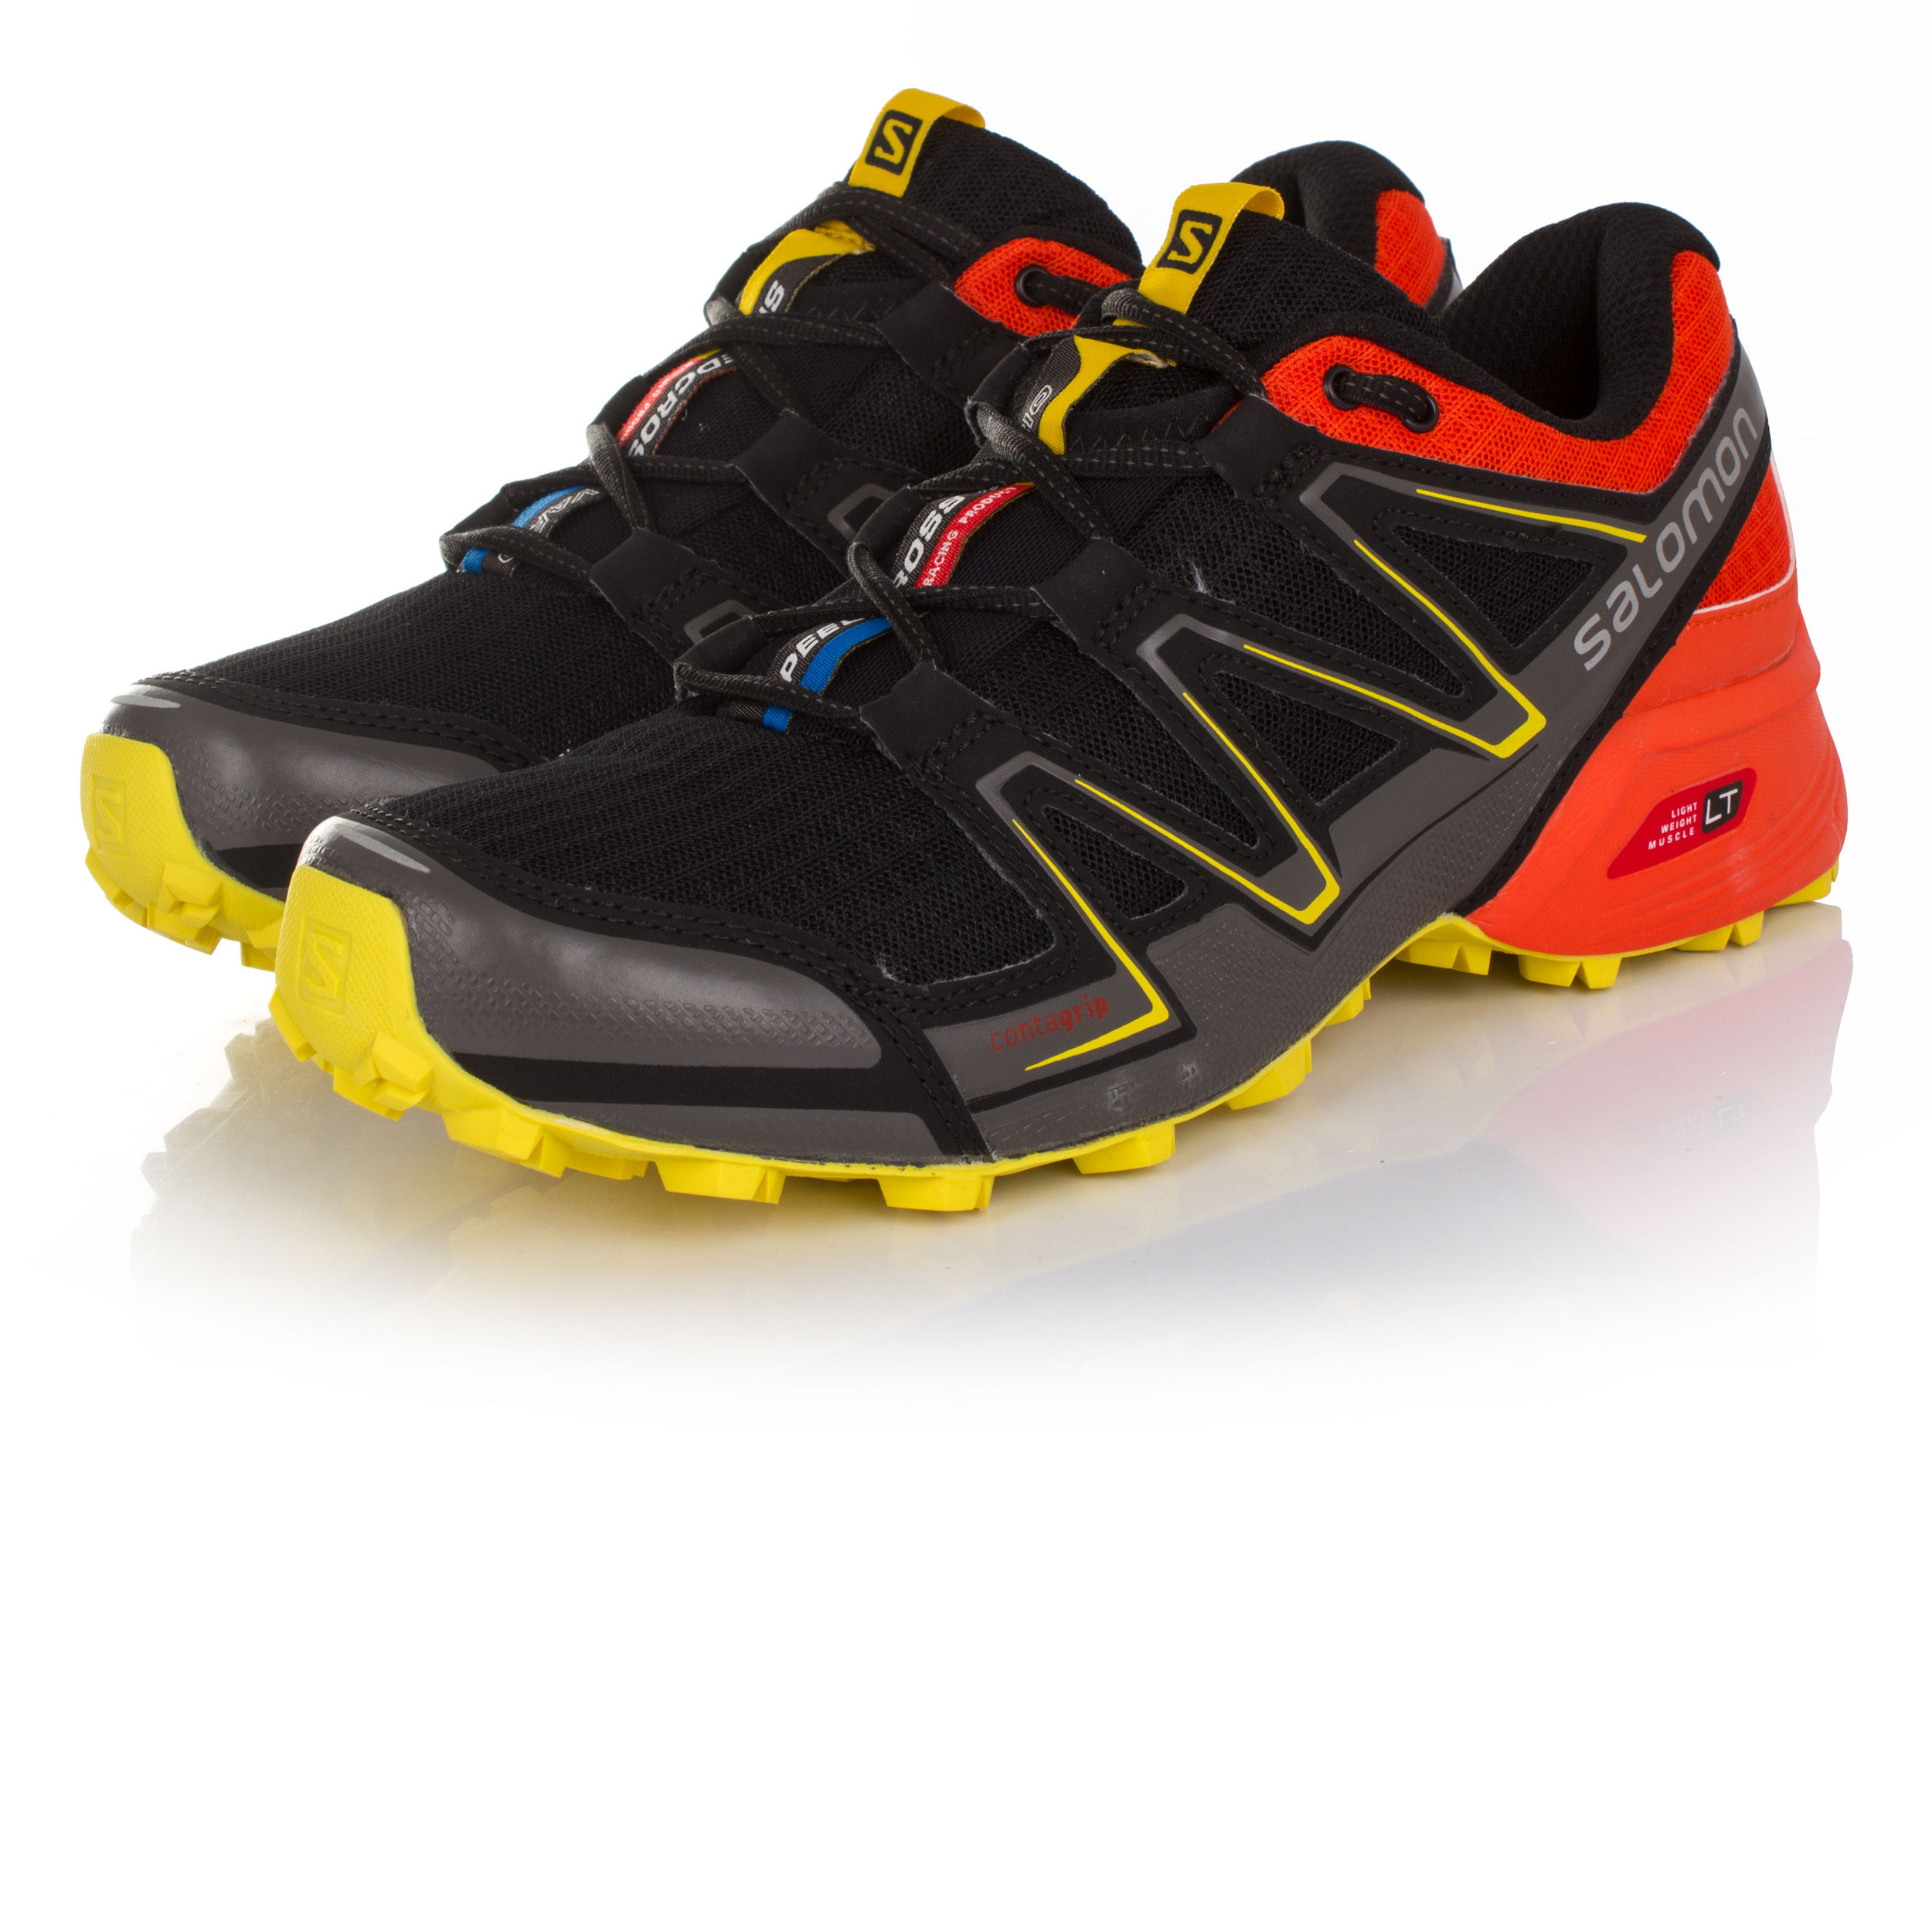 Salomon Speedcross Vario Mens Orange Black Running Sports Shoes Trainers